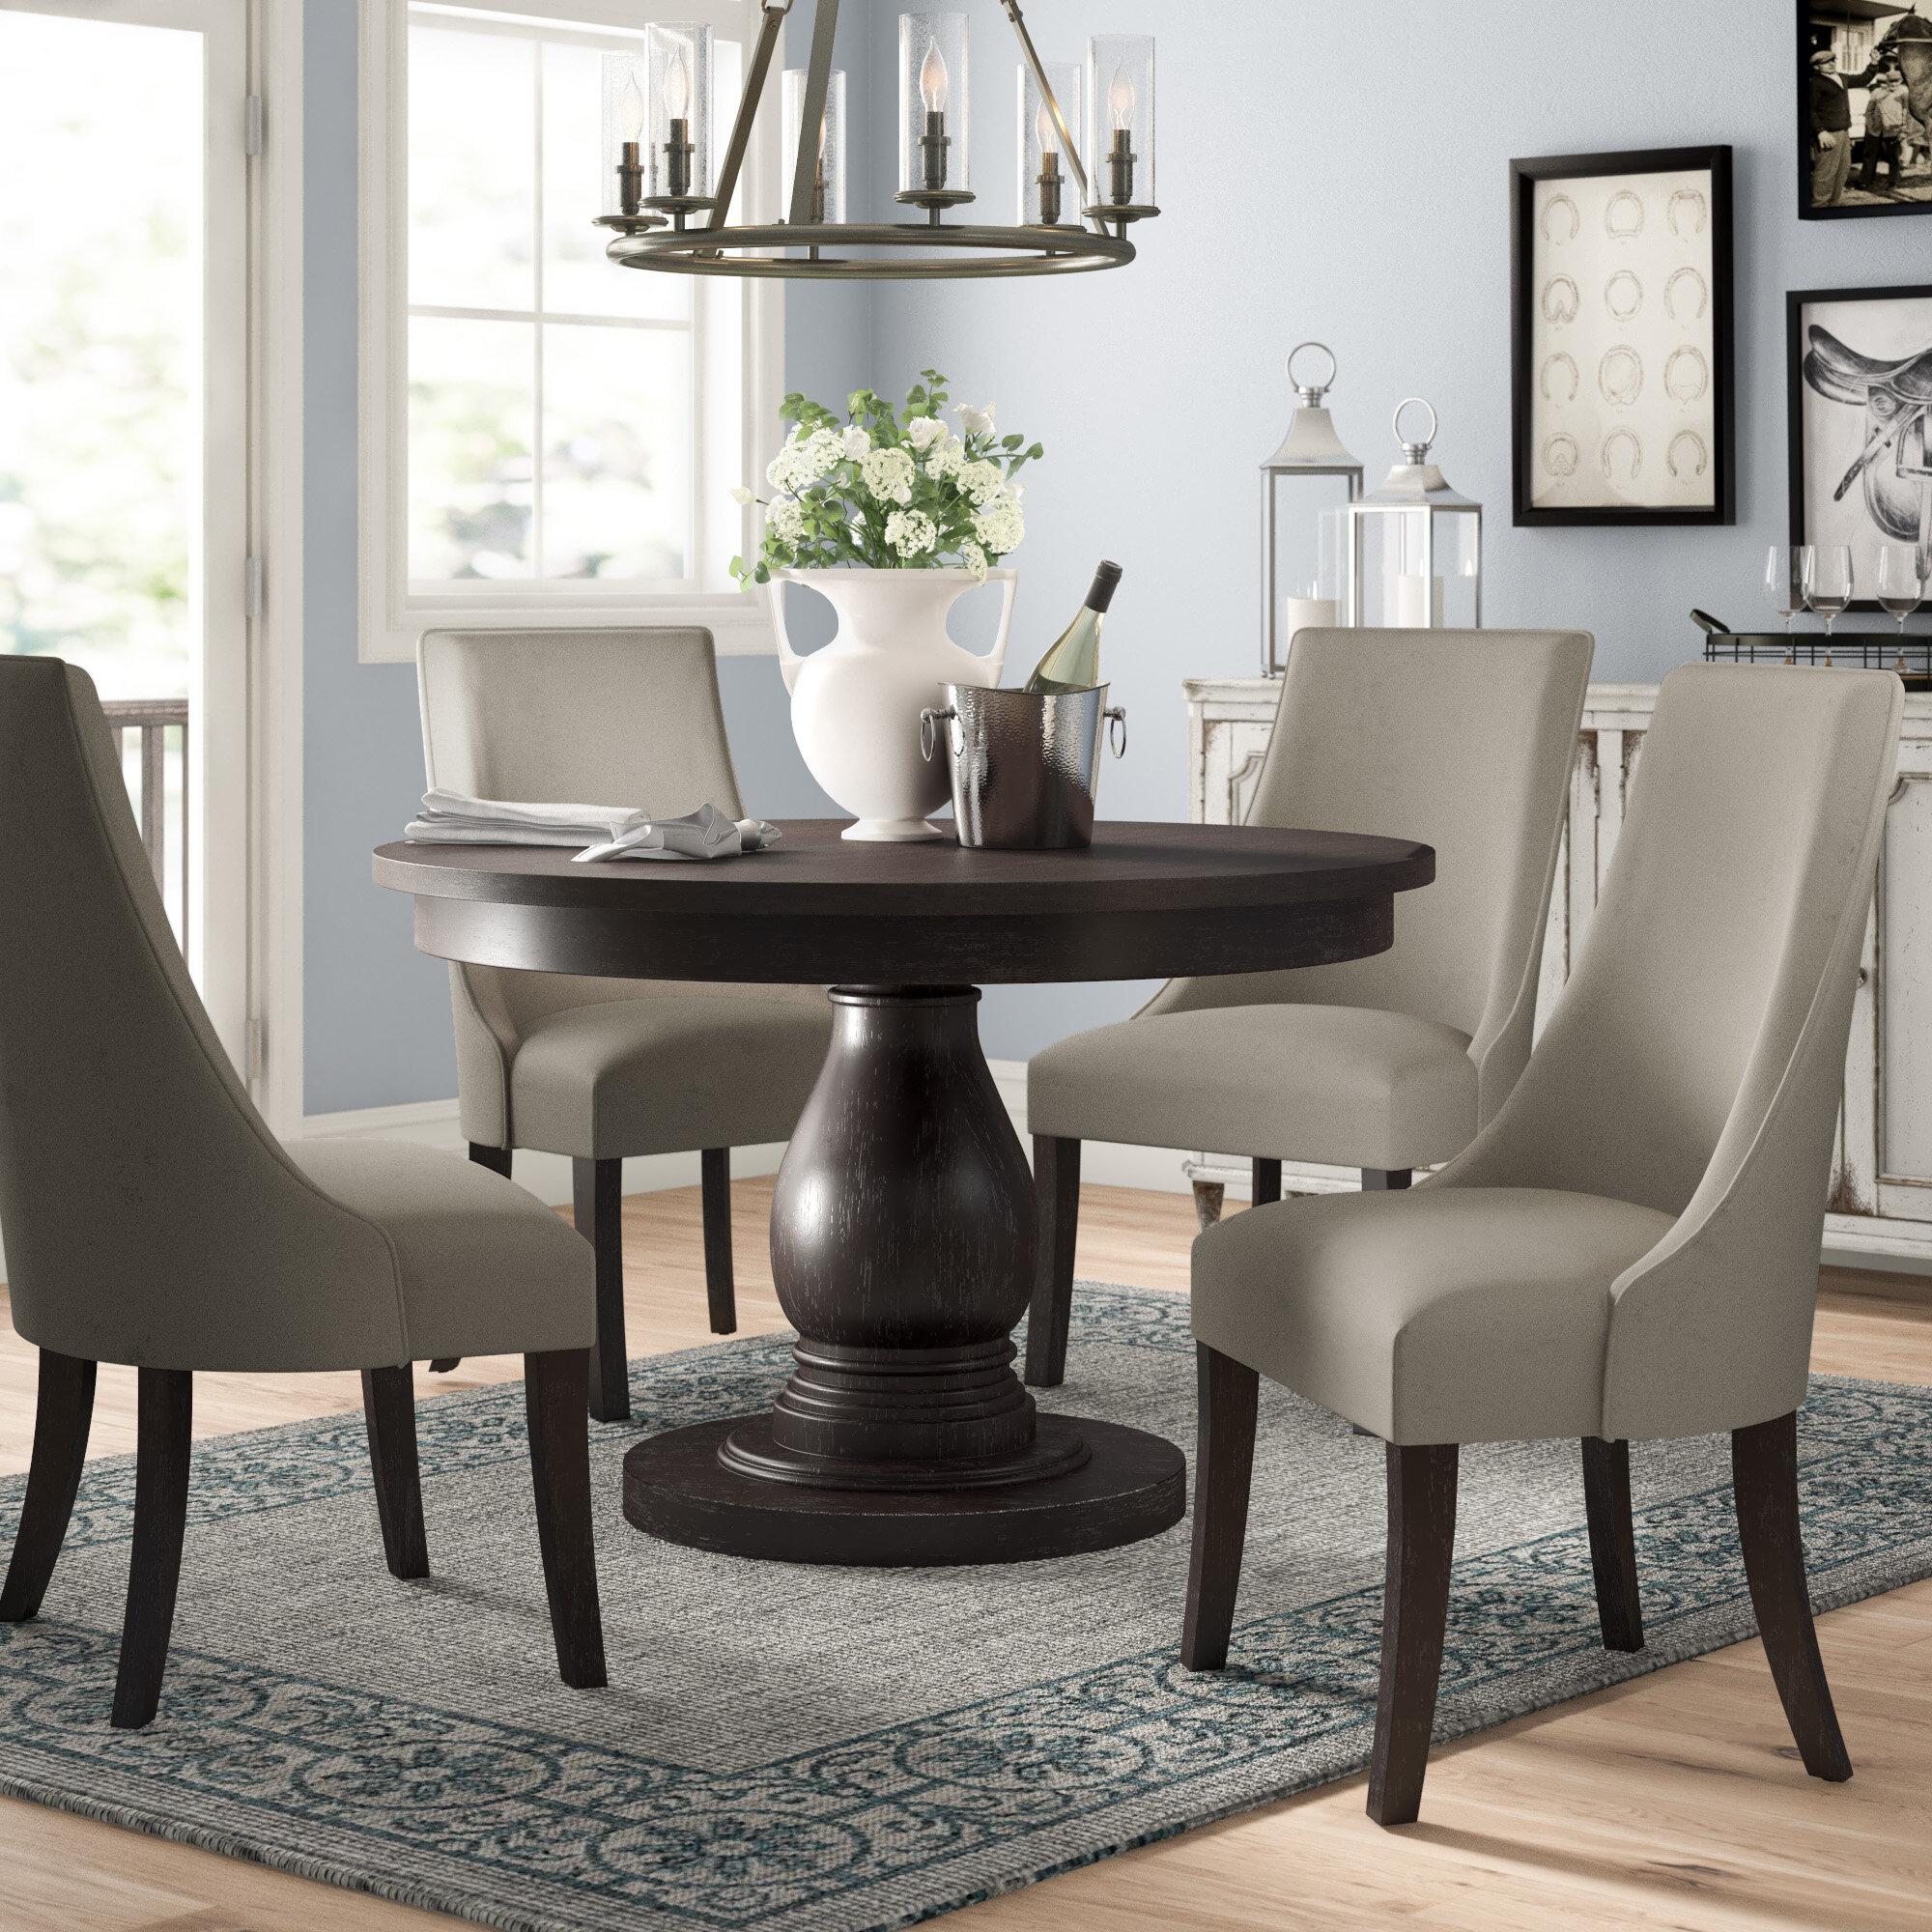 Three Posts Barrington 5 Piece Dining Set & Reviews | Wayfair